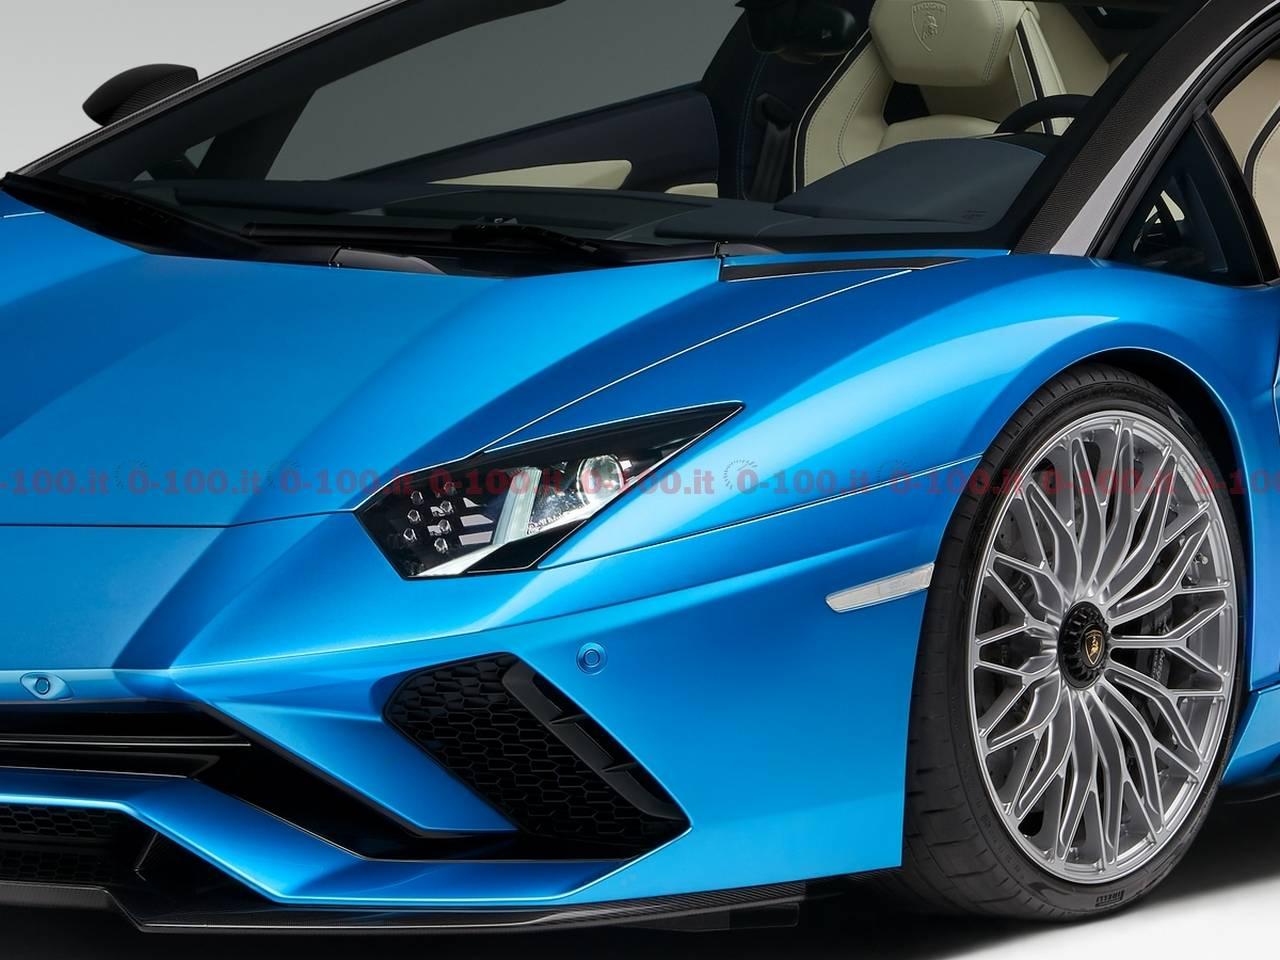 Lamborghini_Aventador_S_Roadster_0-100_19